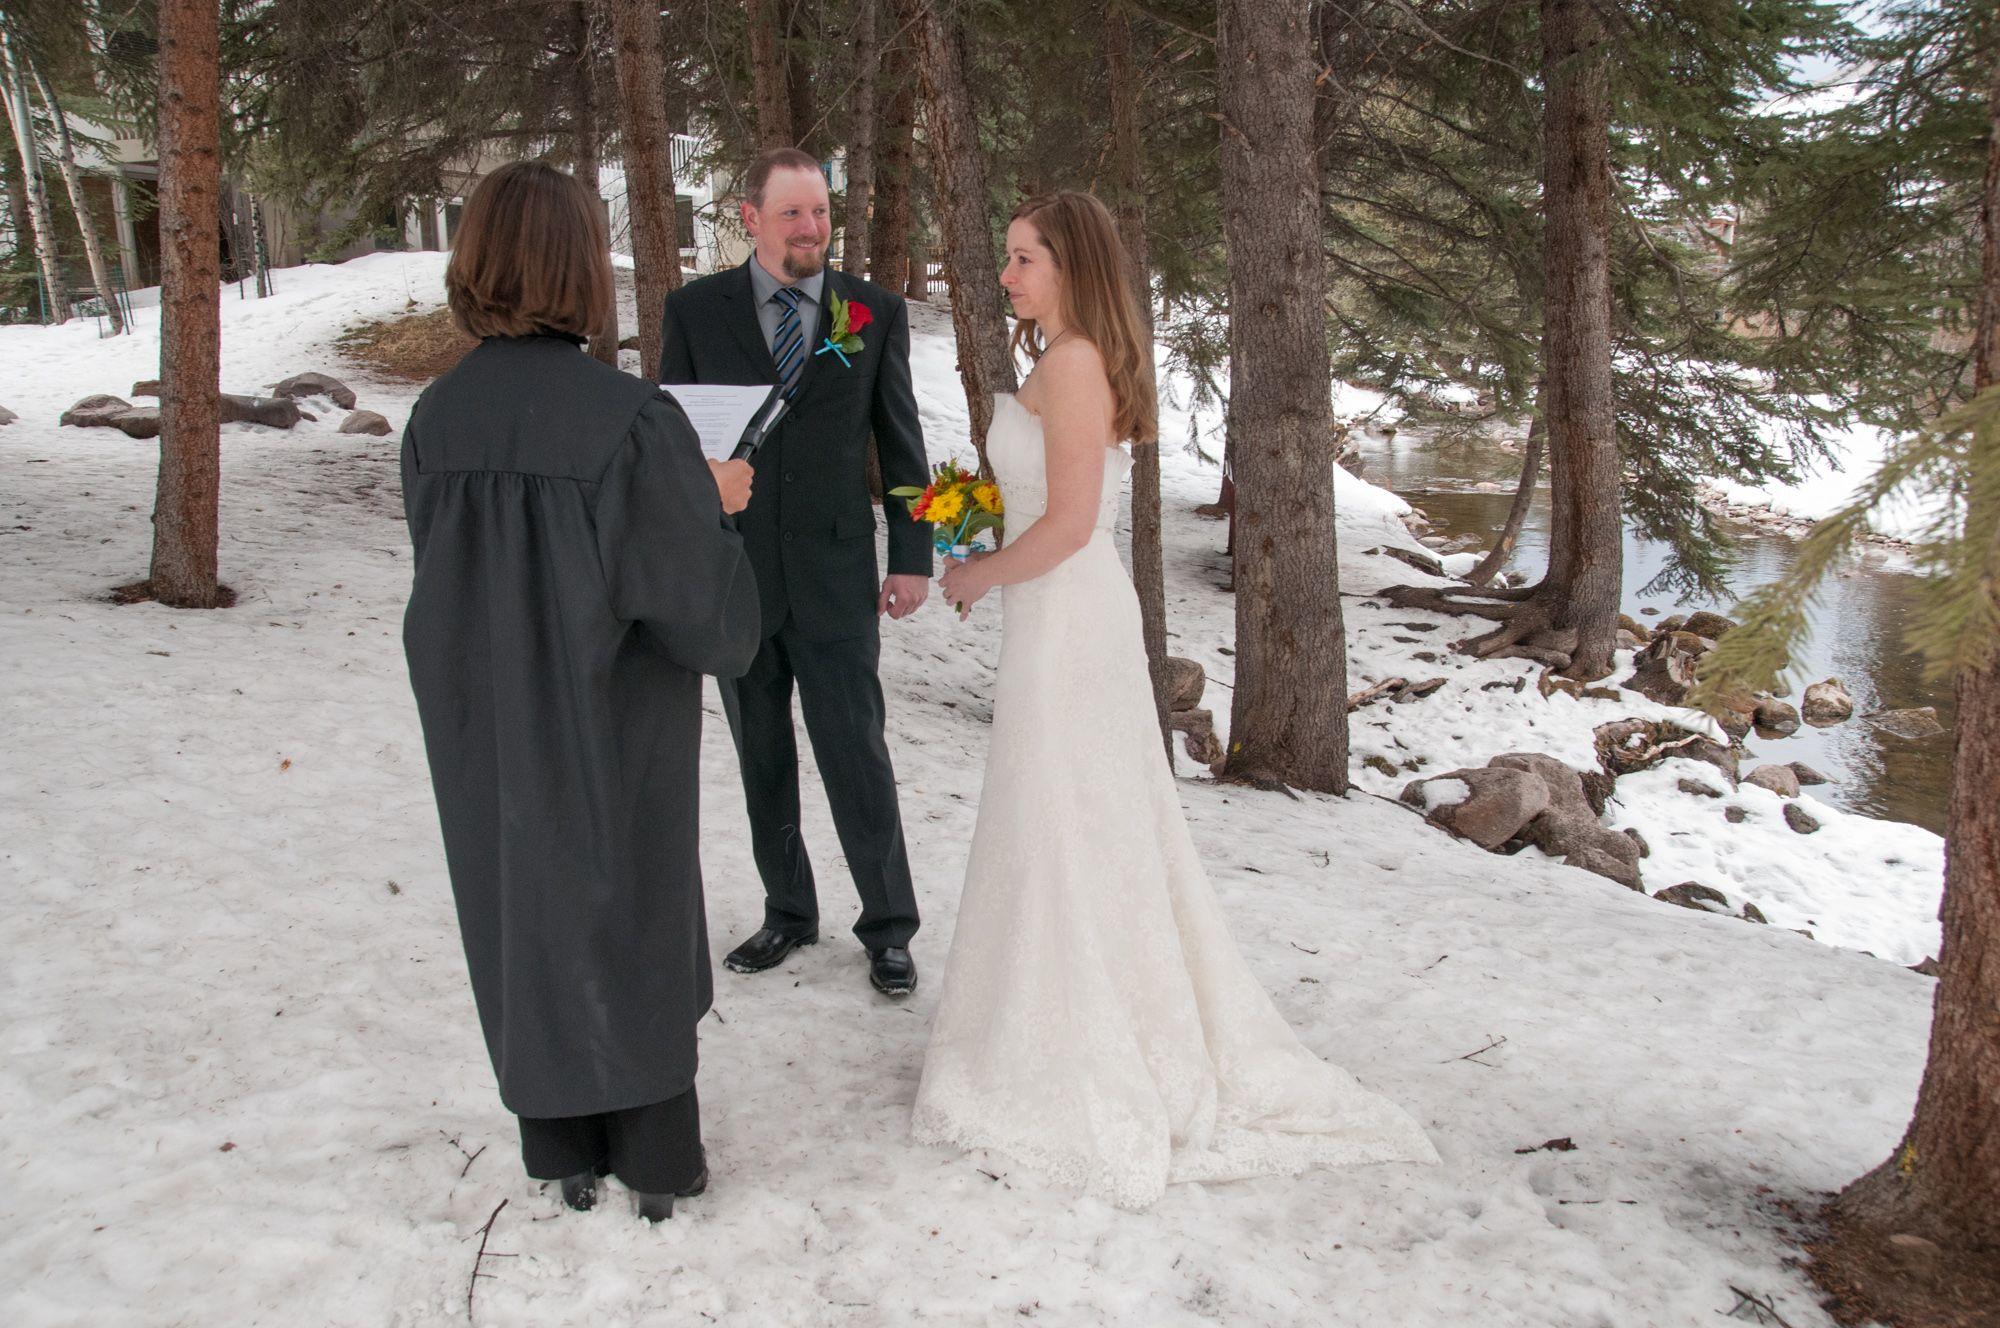 Intimate Winter Wedding Beside The Creek In Vail Colorado